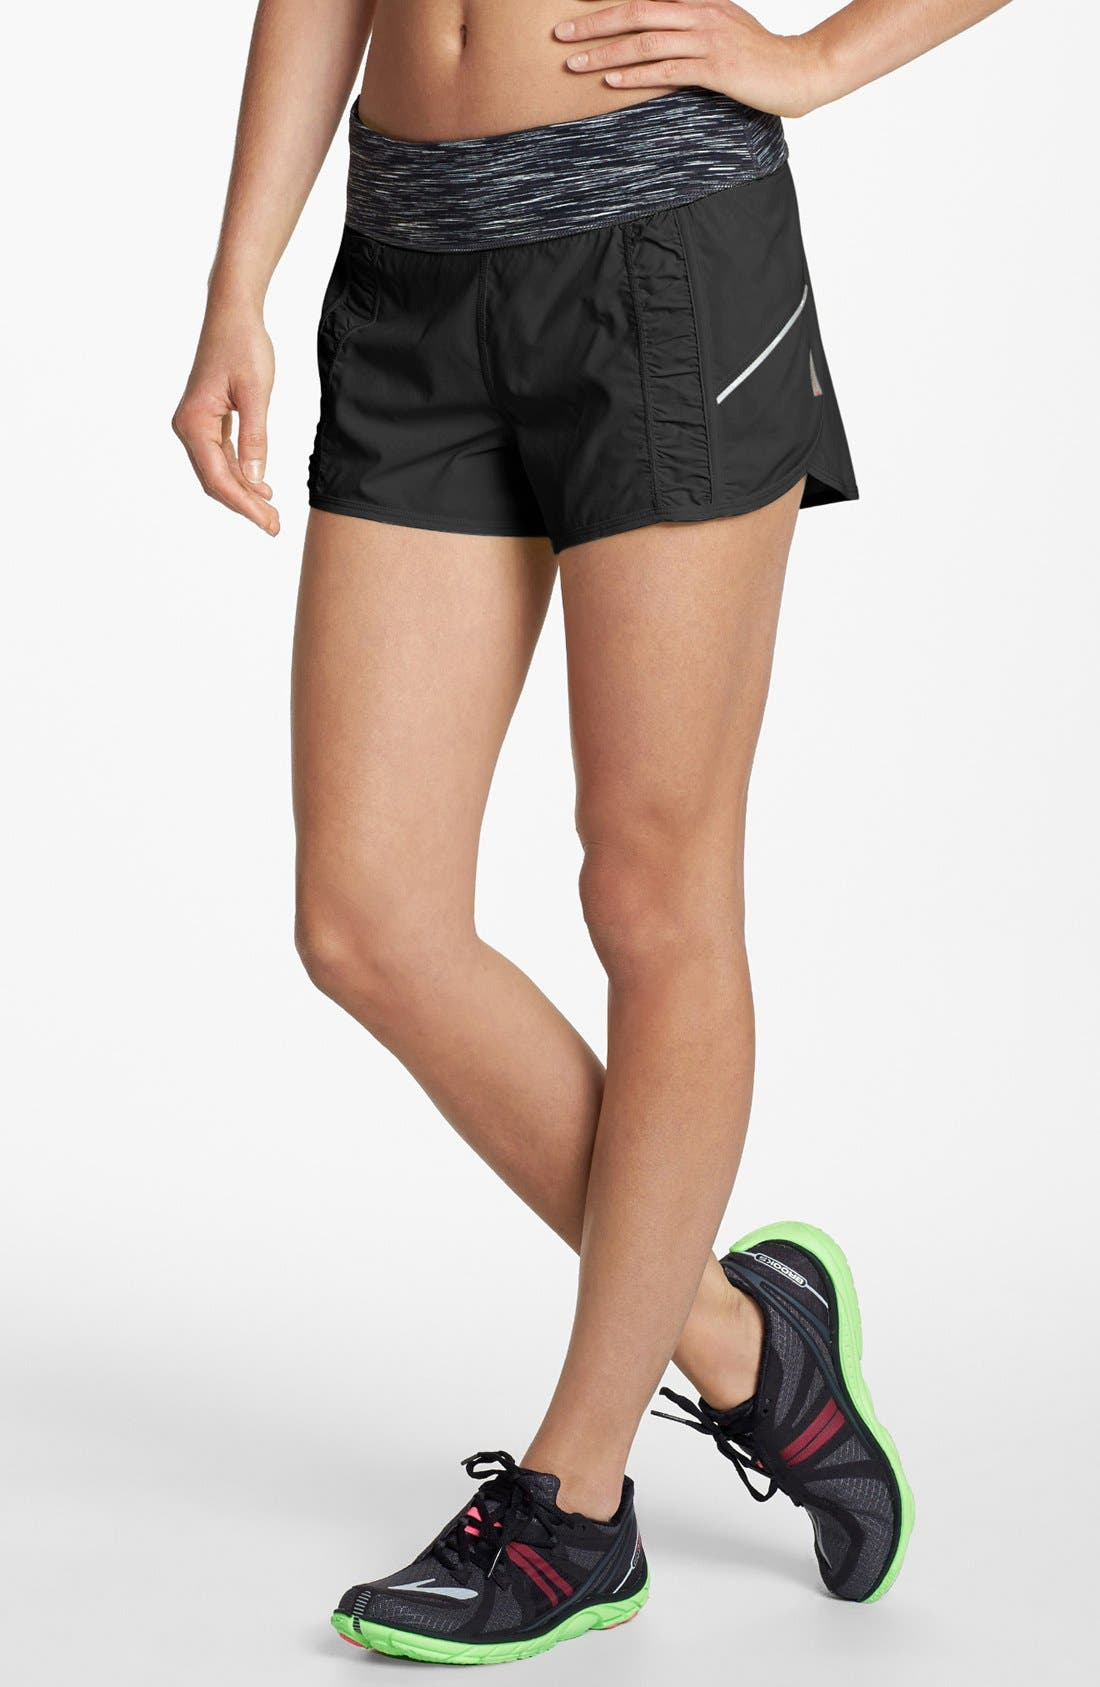 Alternate Image 1 Selected - Zella 'Move 2' Shorts